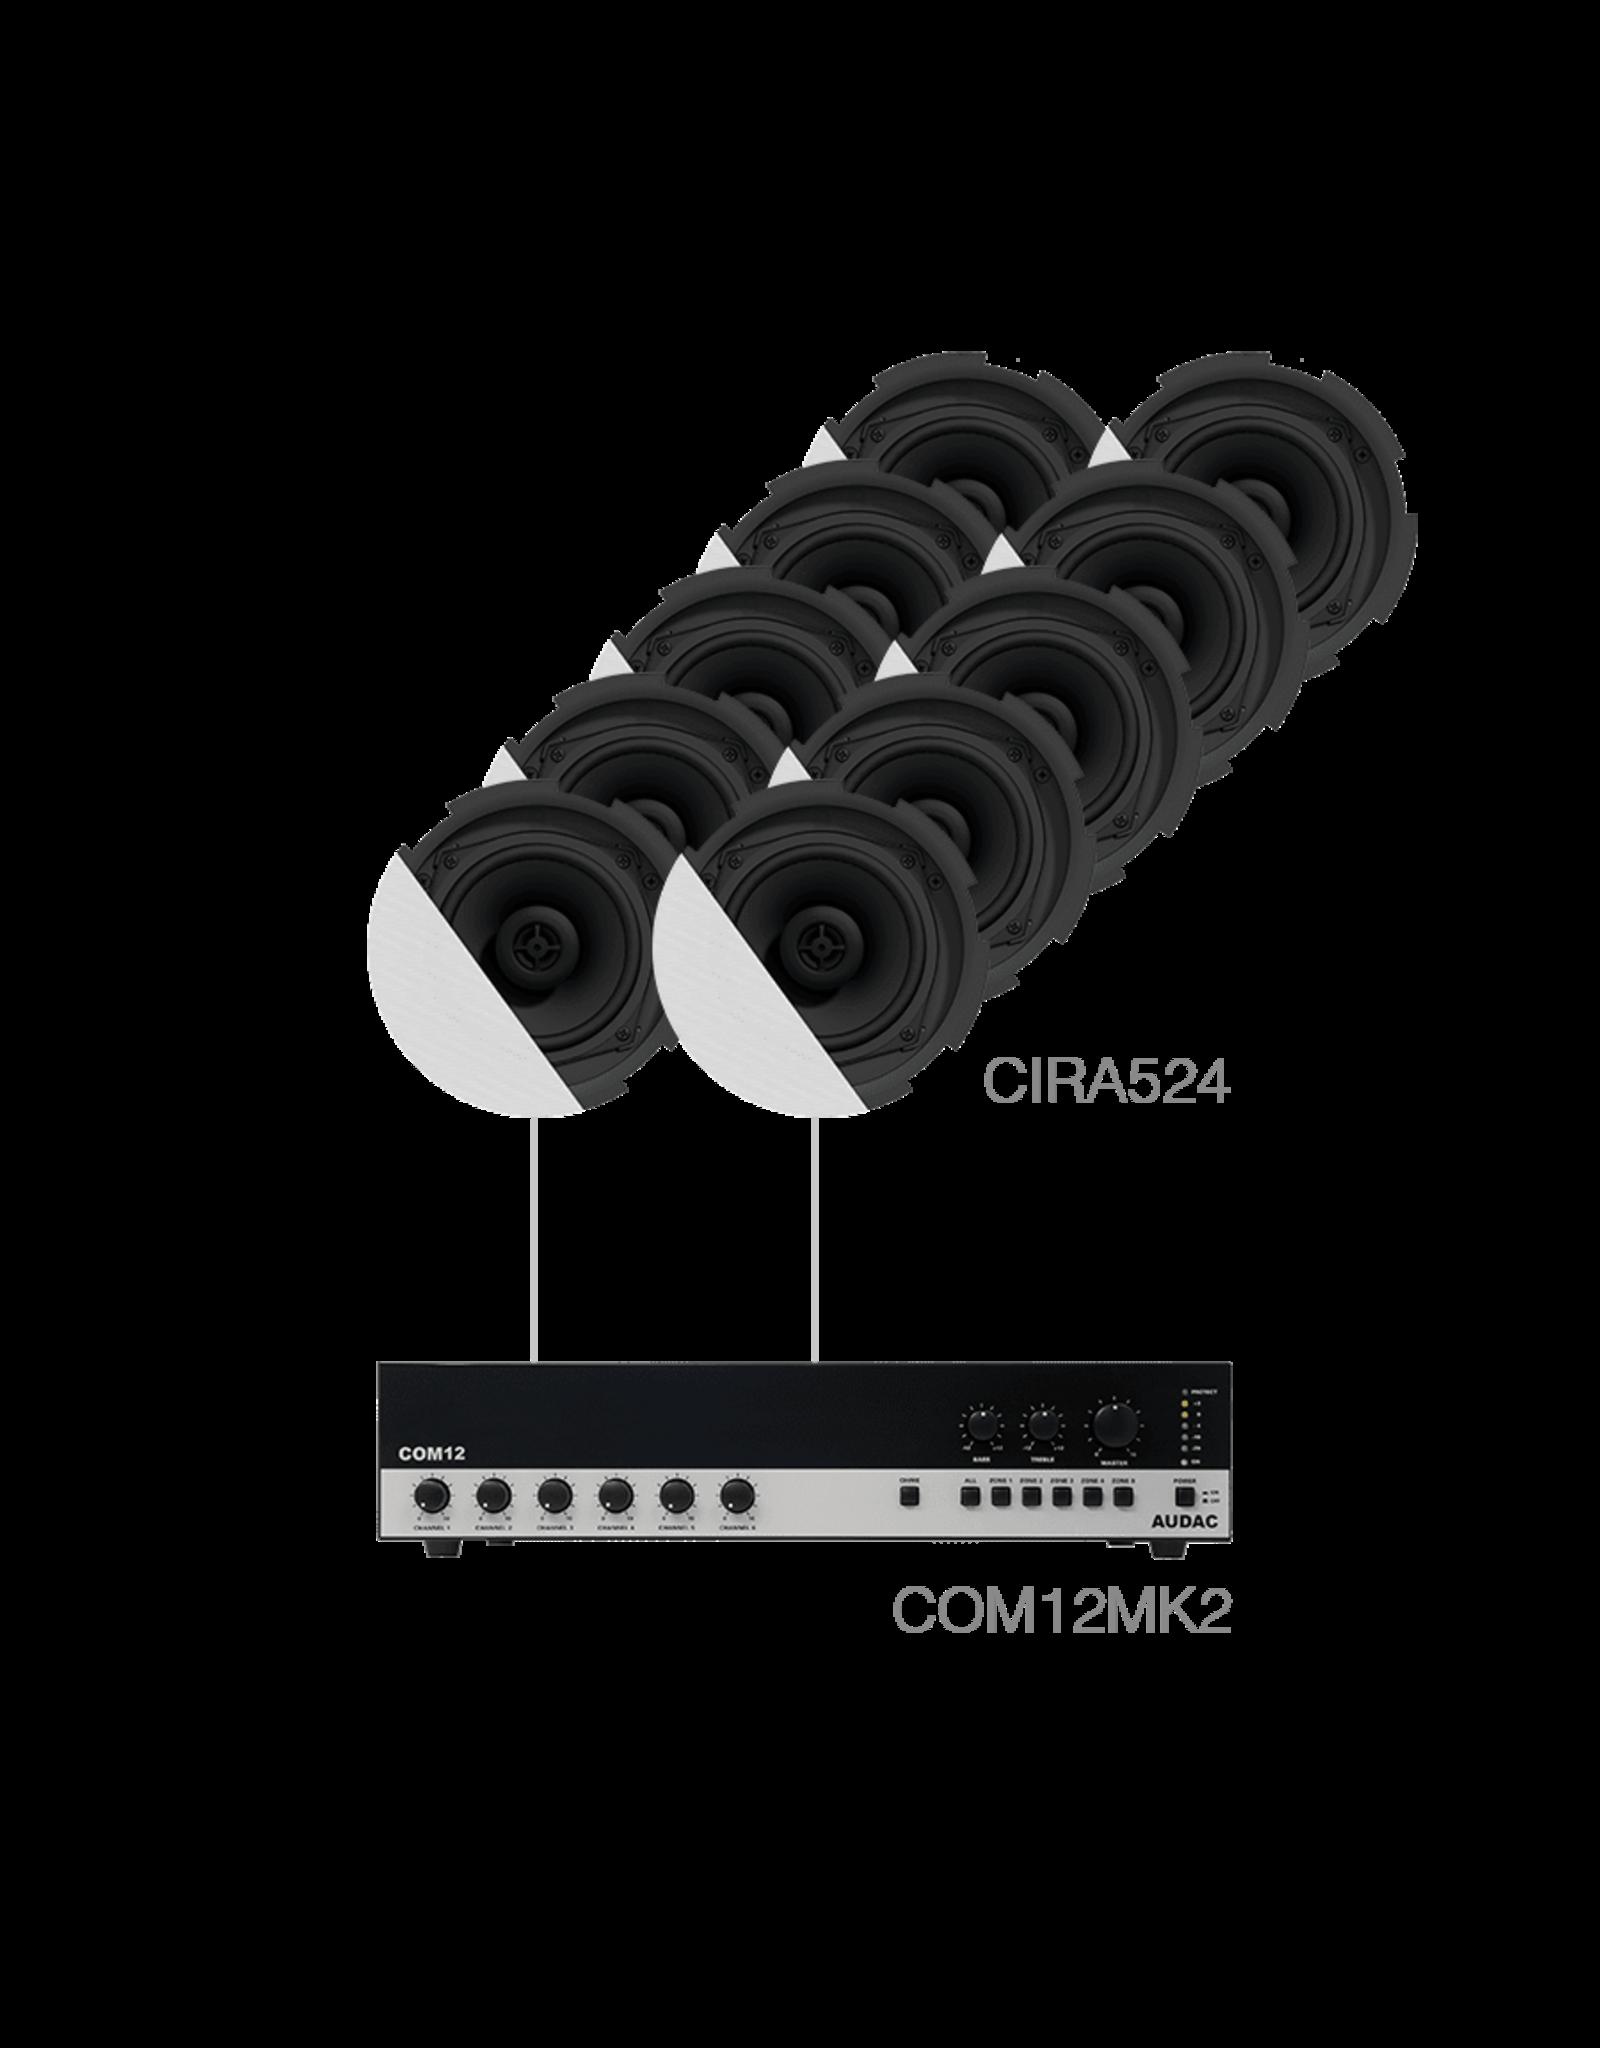 Audac 10 x CIRA524 + COM12MK2 White version